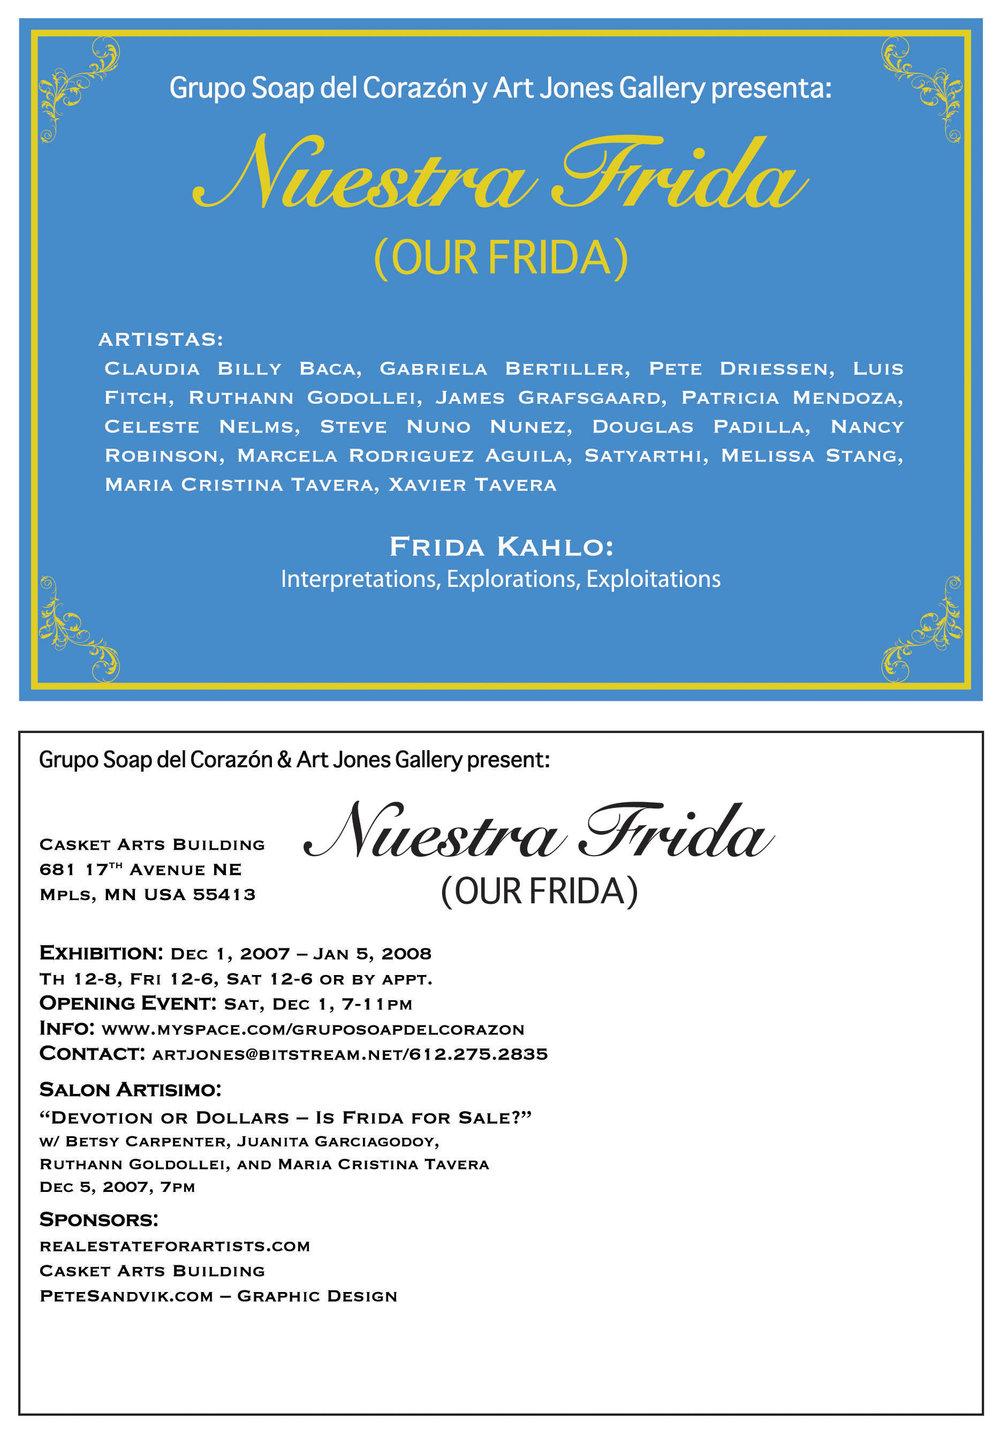 Nuestra Frida Postcard 2 WEB final.jpg